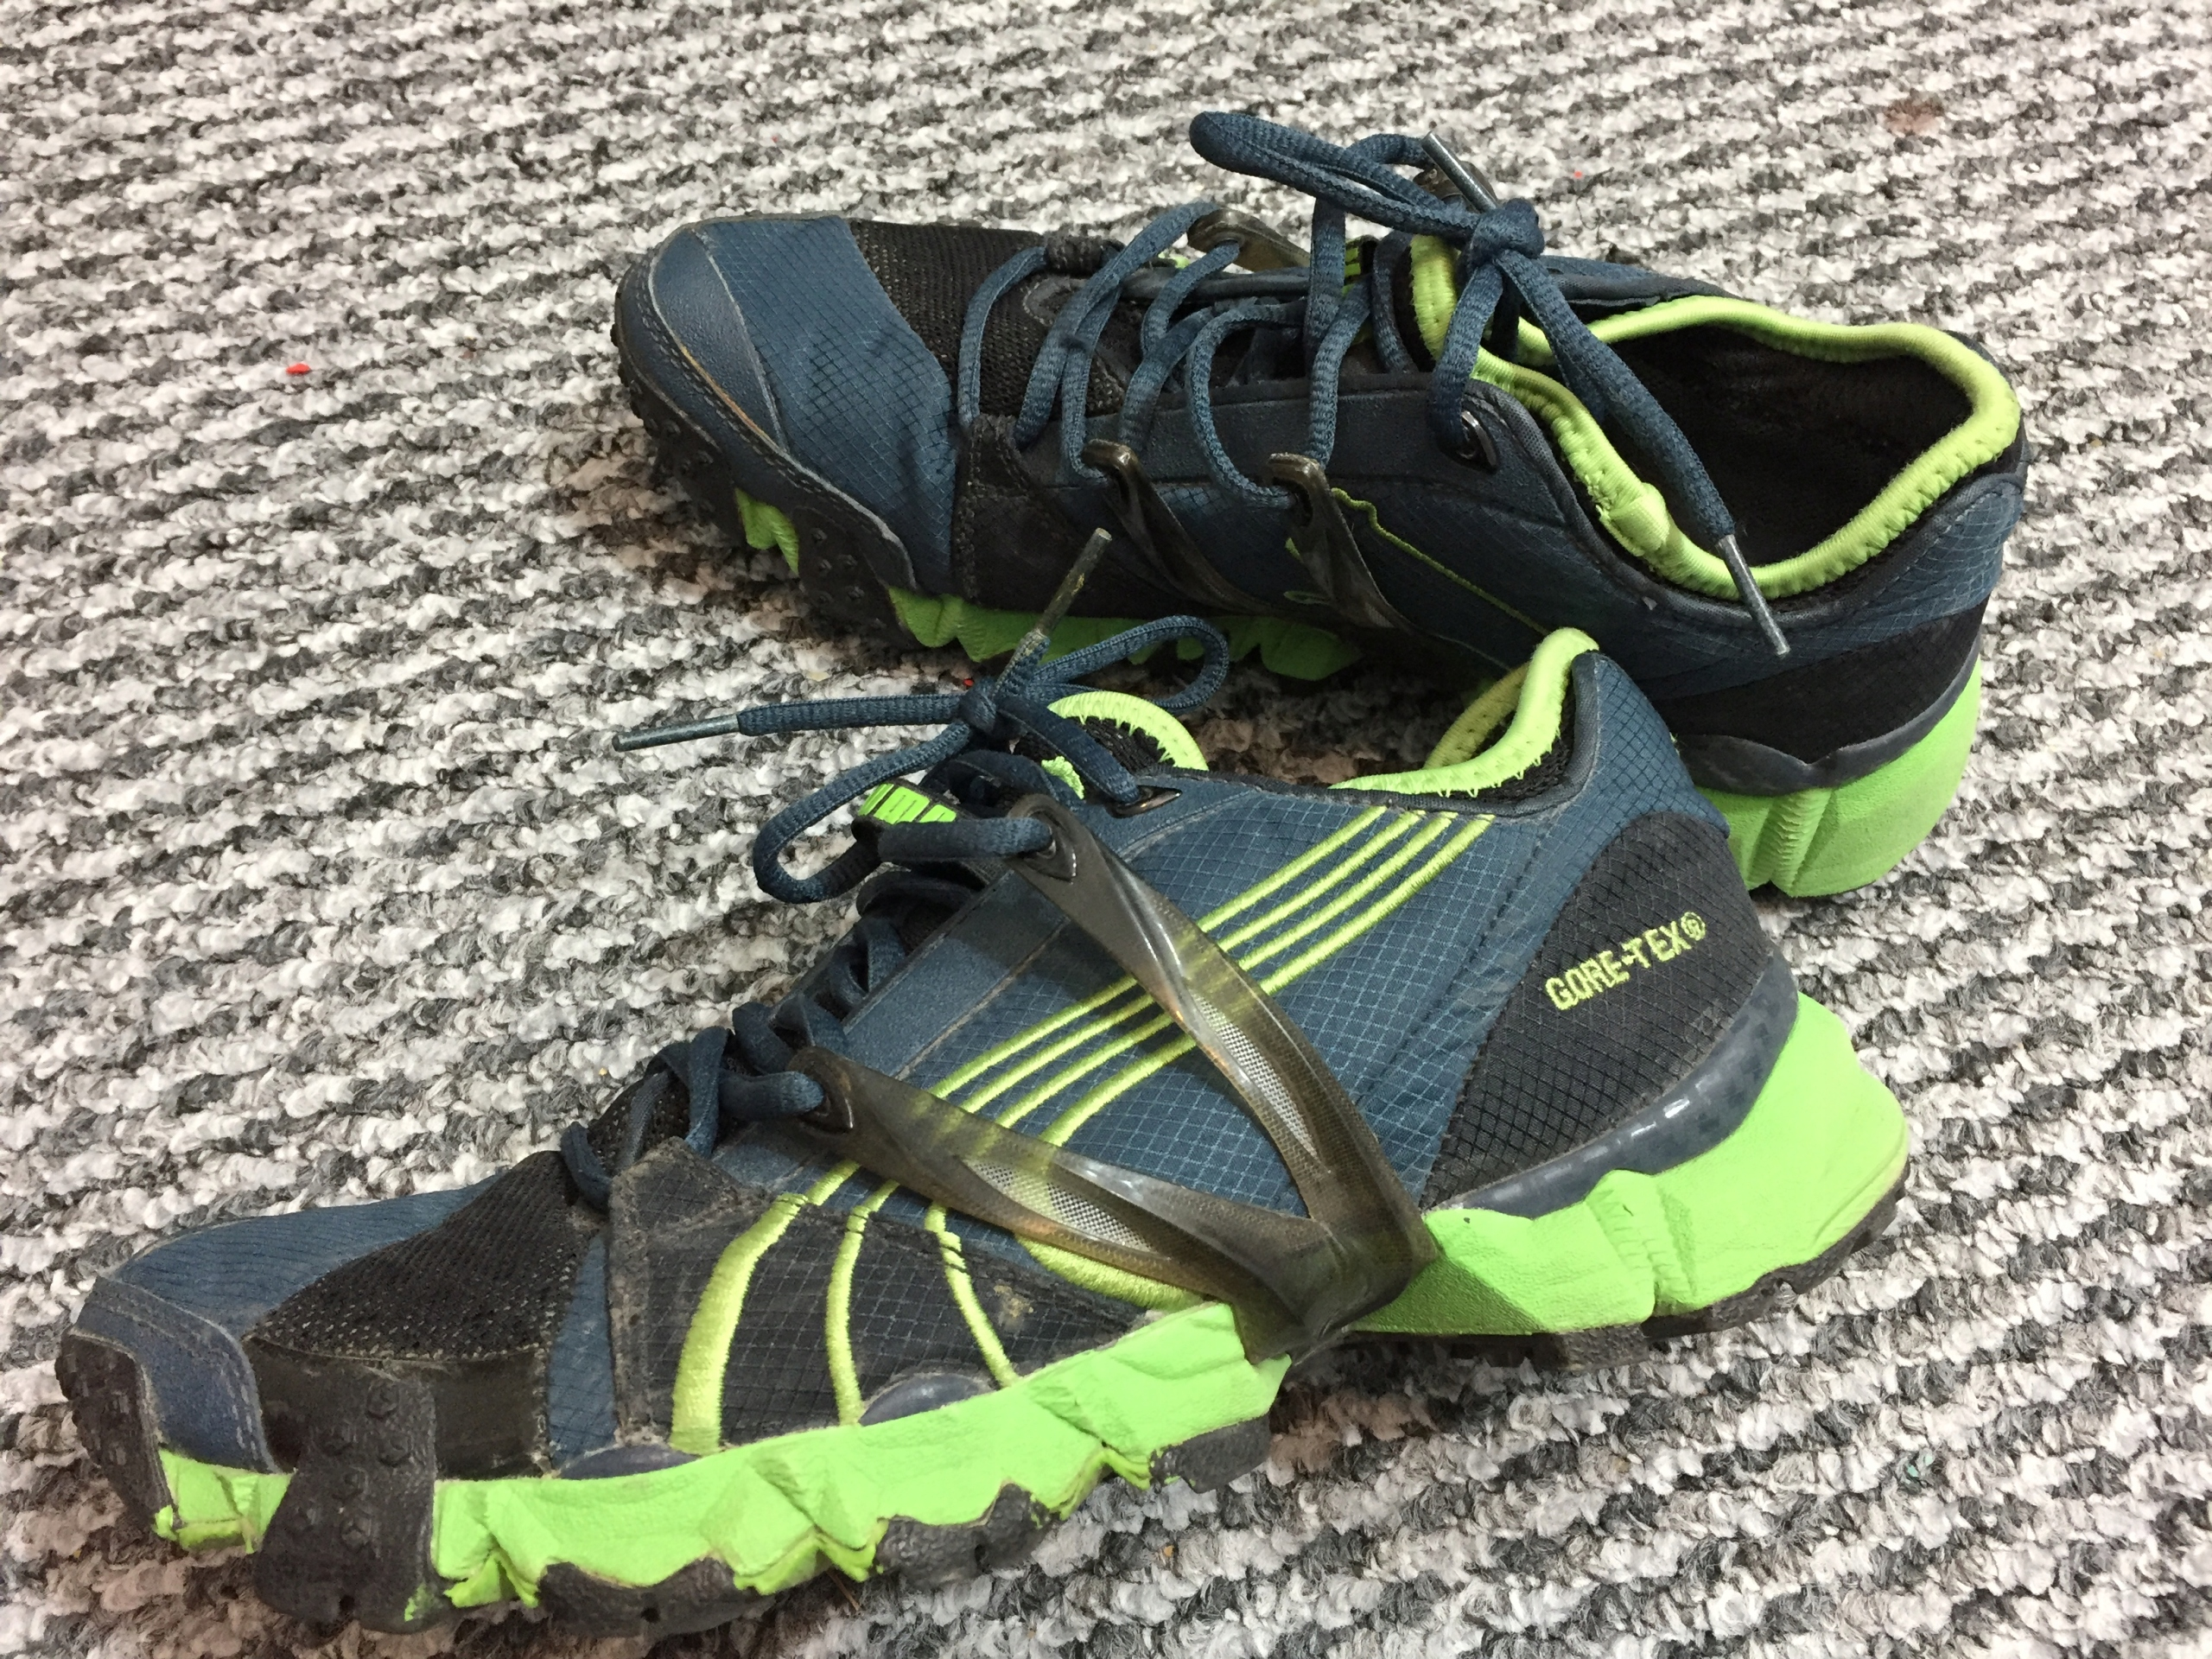 PUMA Complete GORE-TEX Trail Buty Biegowe -39 1/2